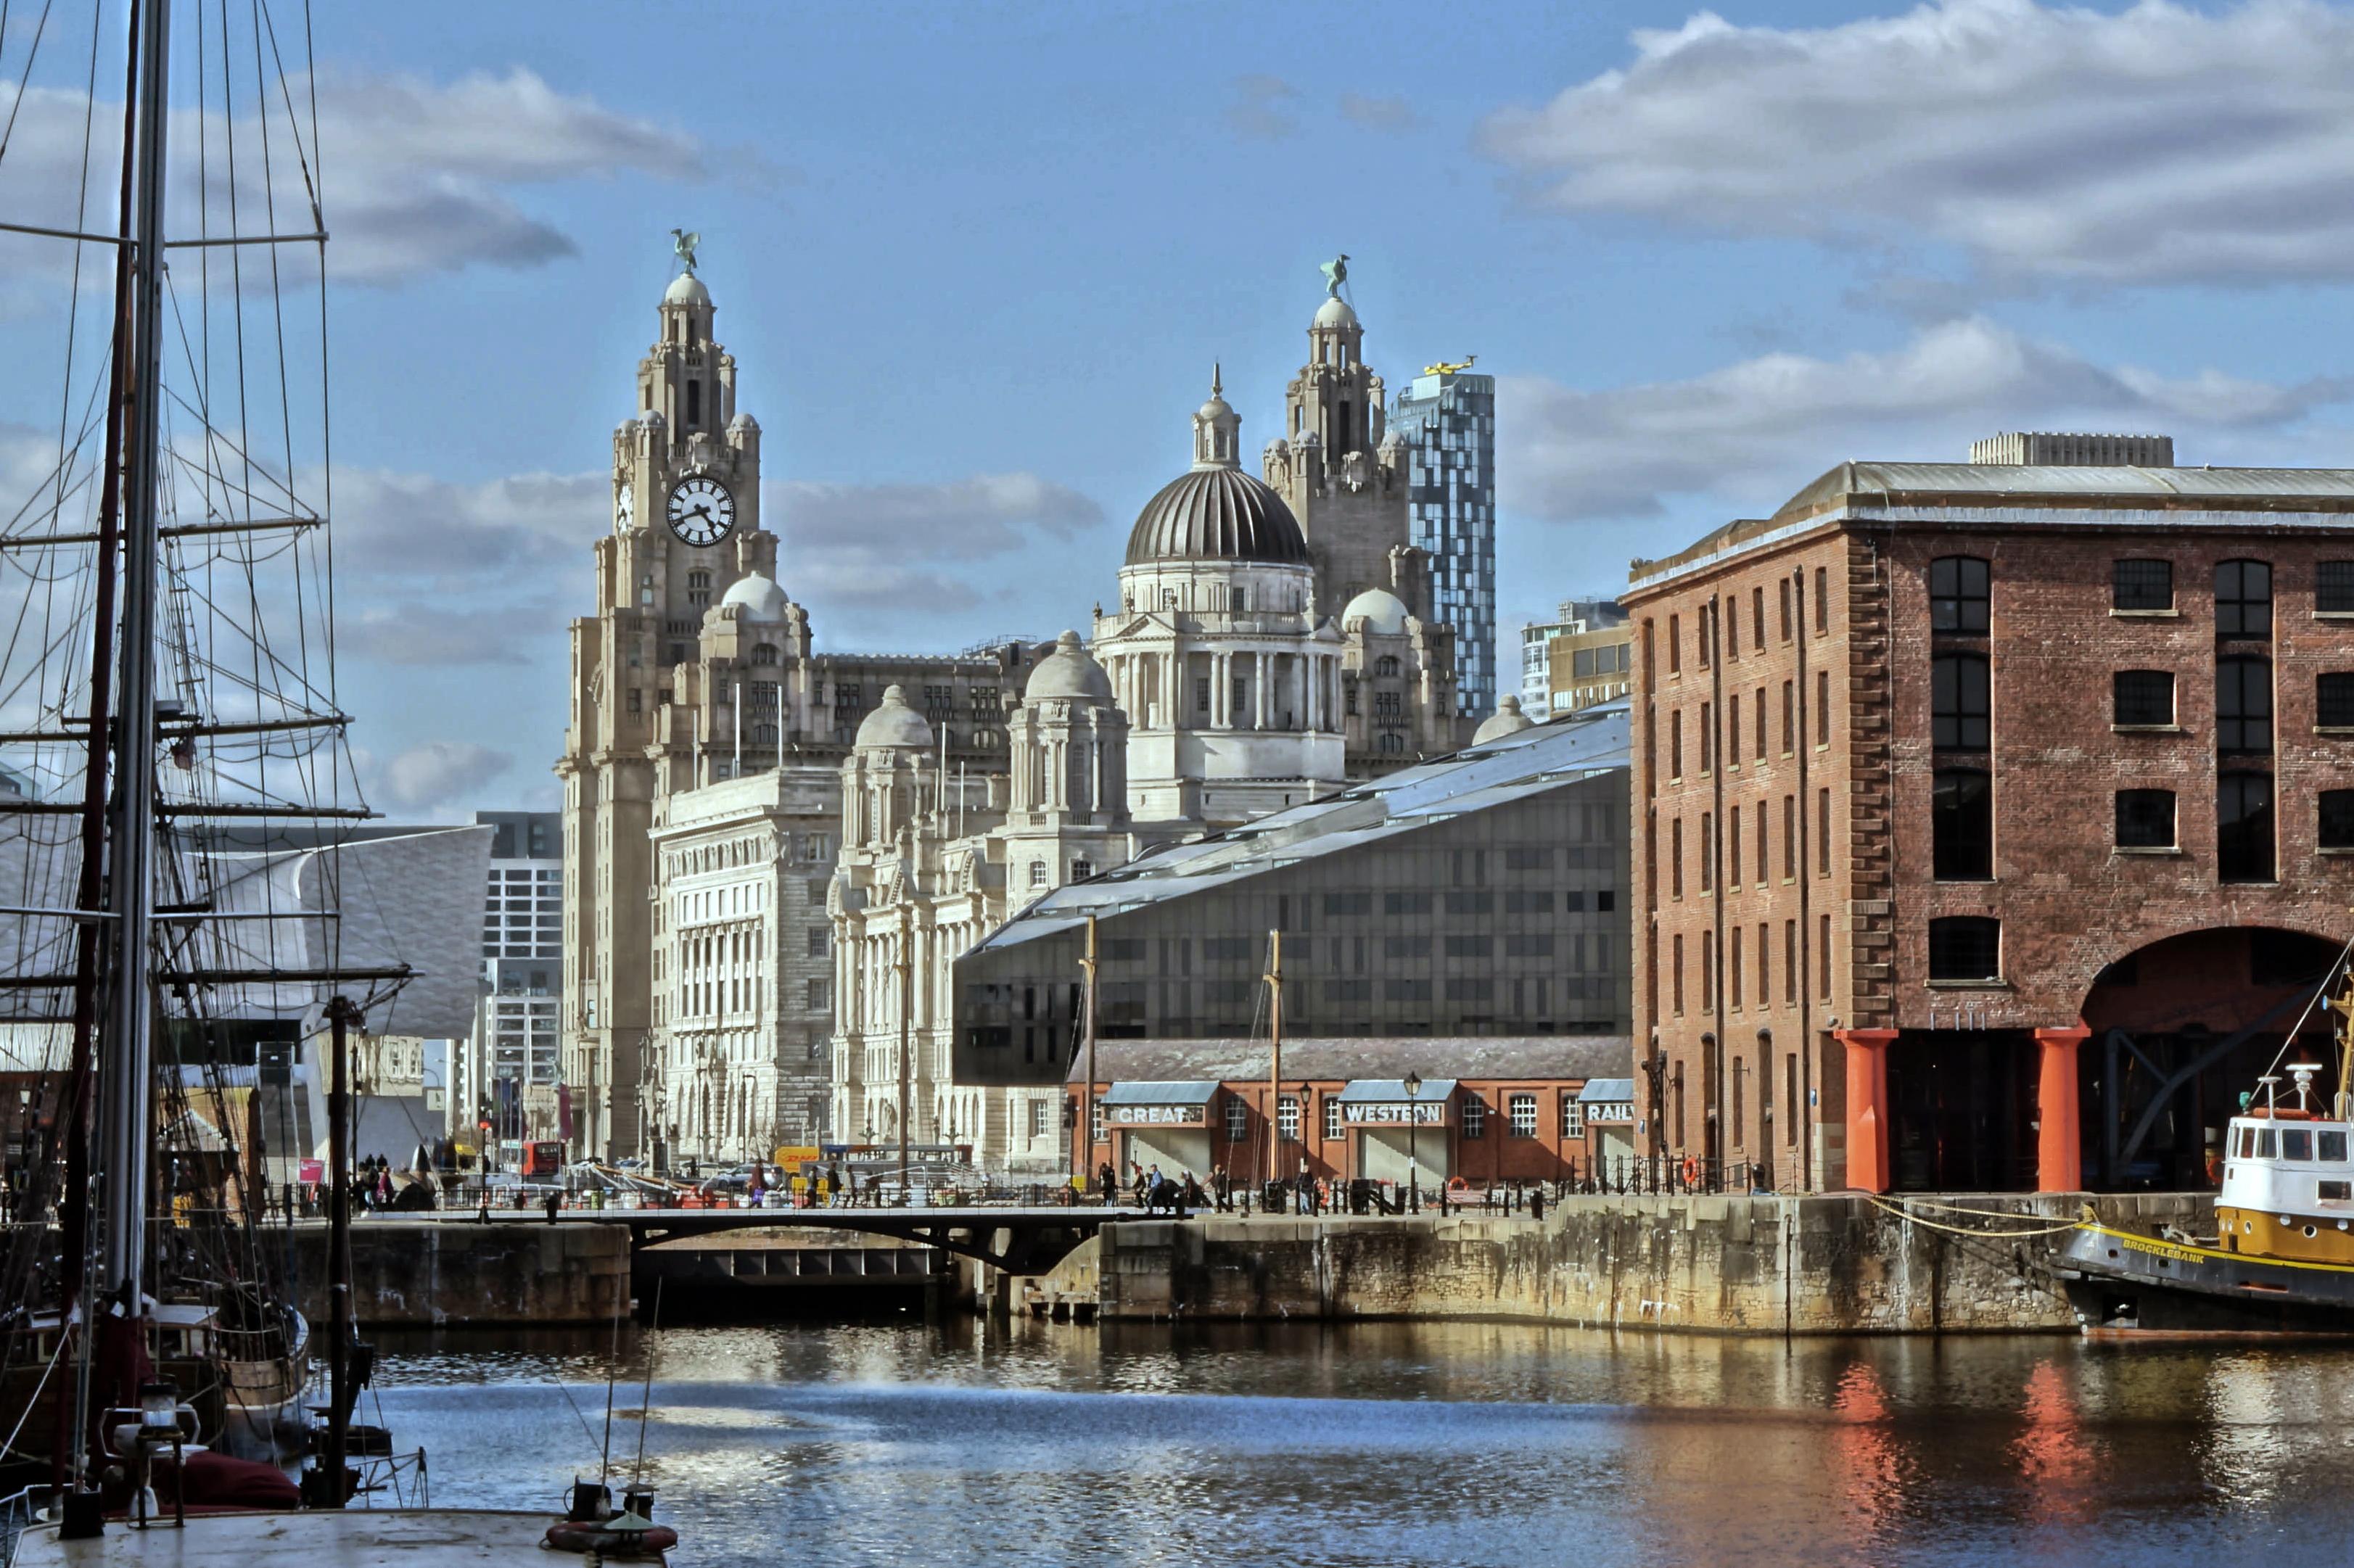 Liverpool docks view